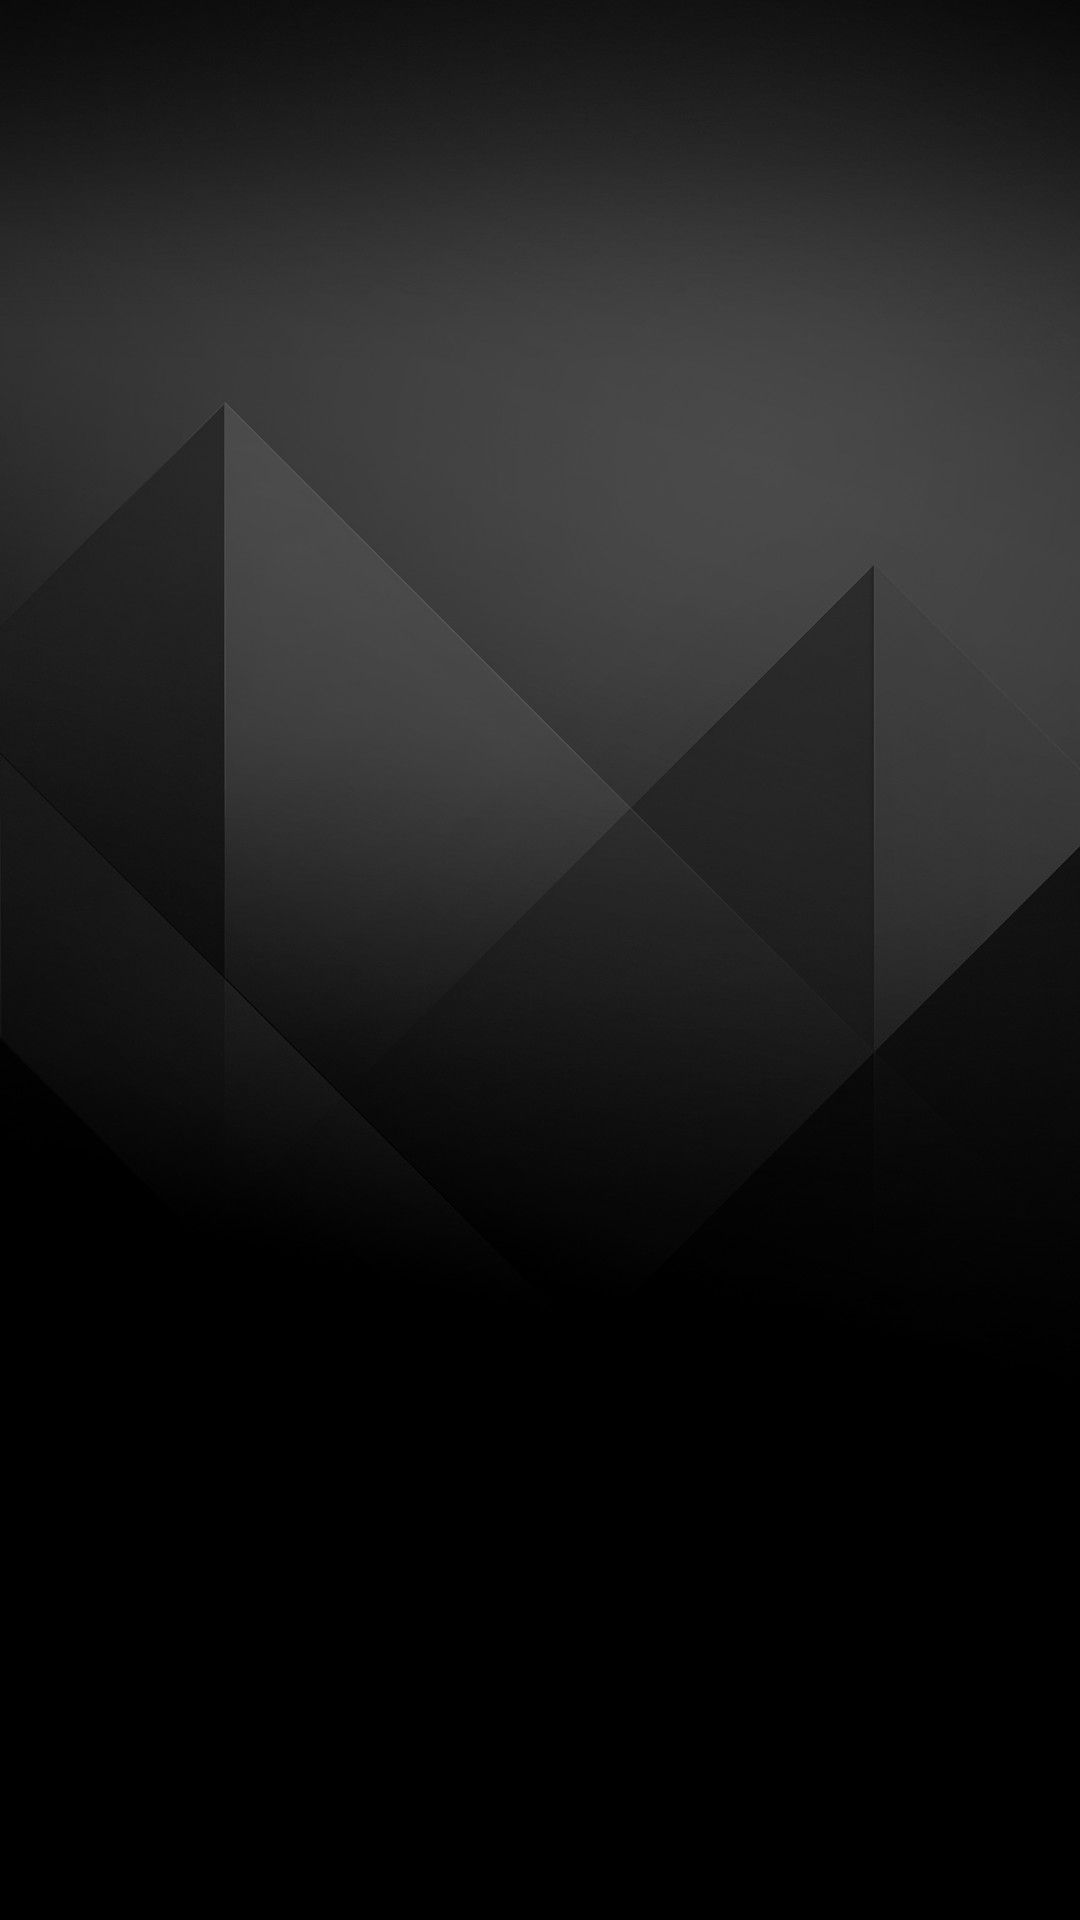 Dark Iphone Wallpaper Black Wallpaper Dark Wallpaper Iphone Wallpaper